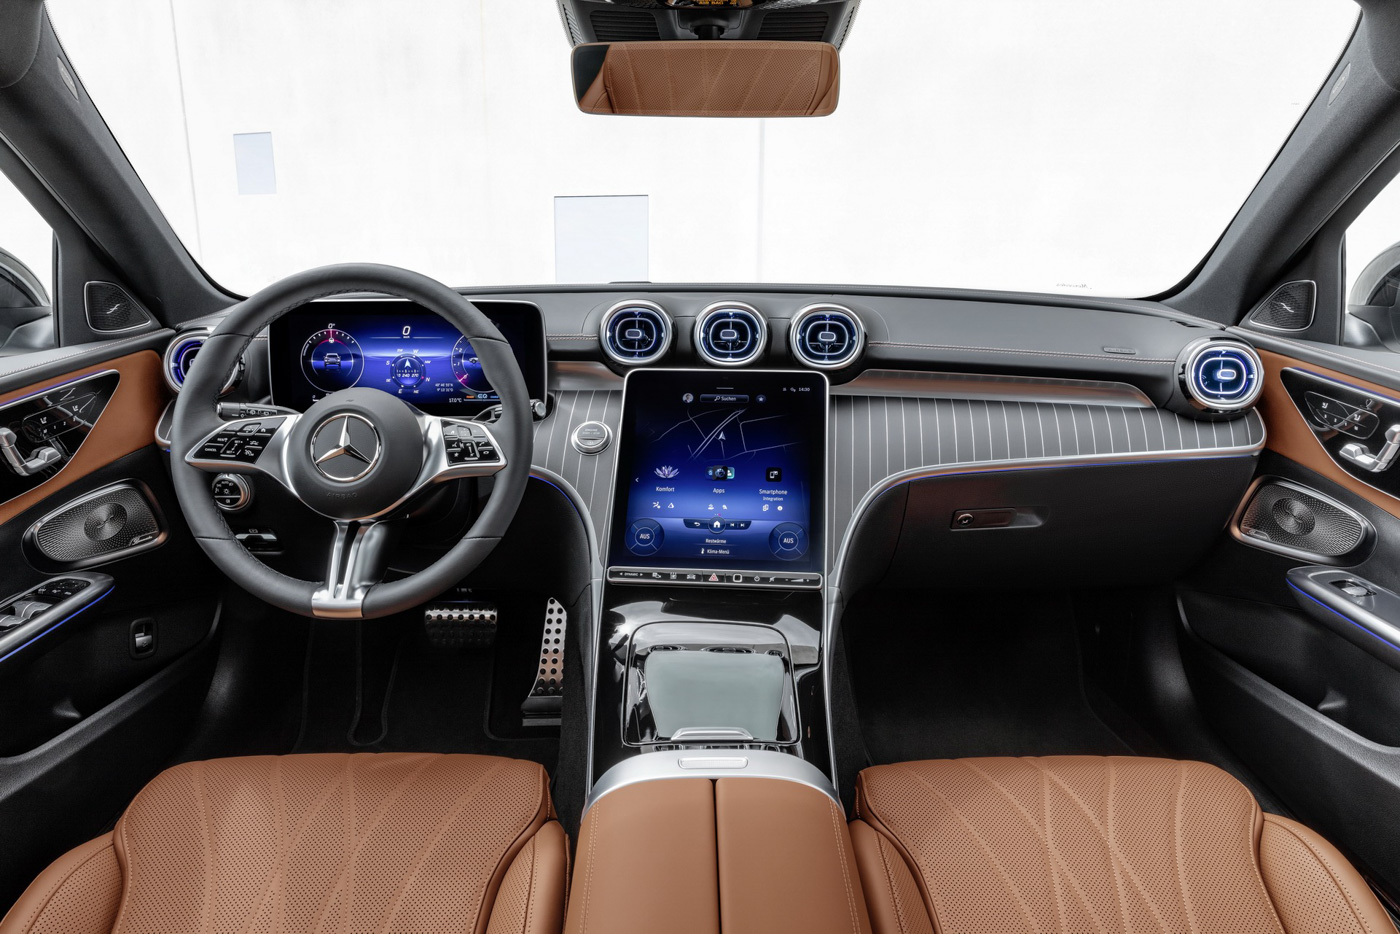 Mercedes-benz-c-class-all-terrain-di-den-moi-noi-cung-mau-xe-gia-dinh-day-thuc-dung (5).JPG